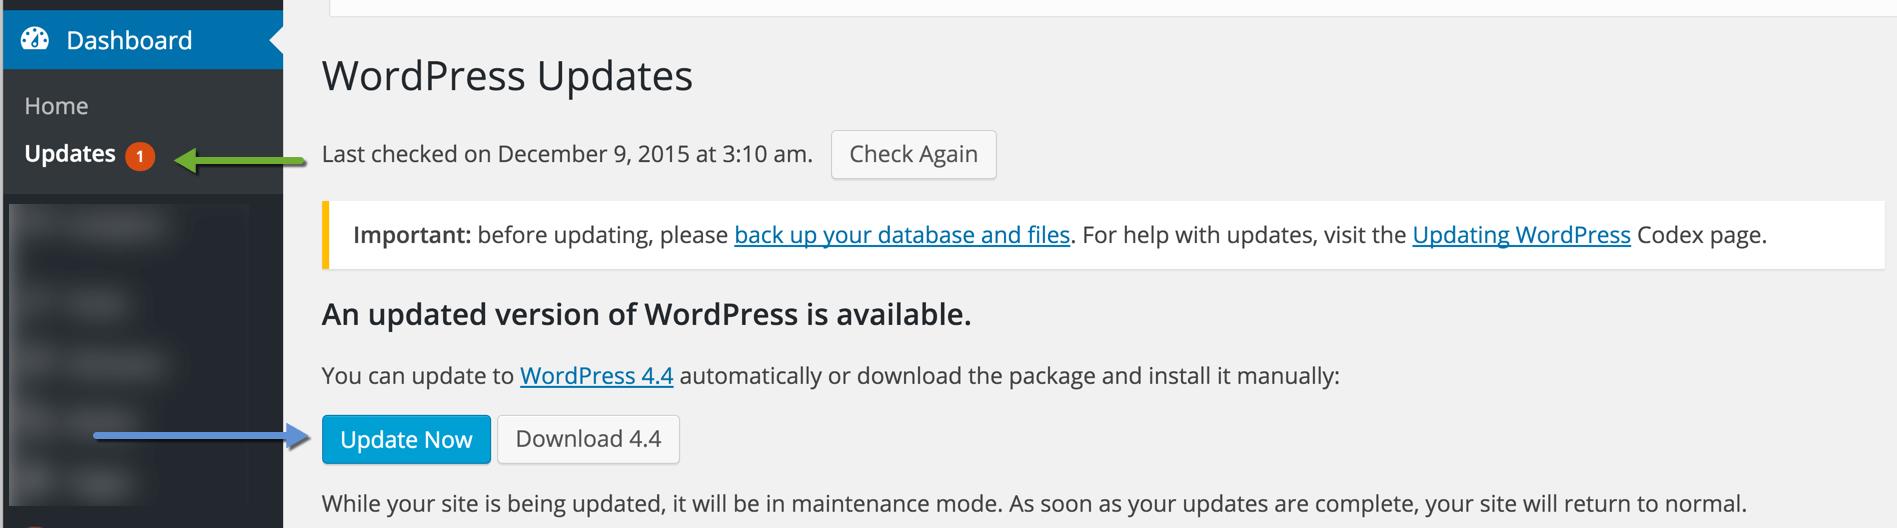 Update to WordPress 4.4 Version